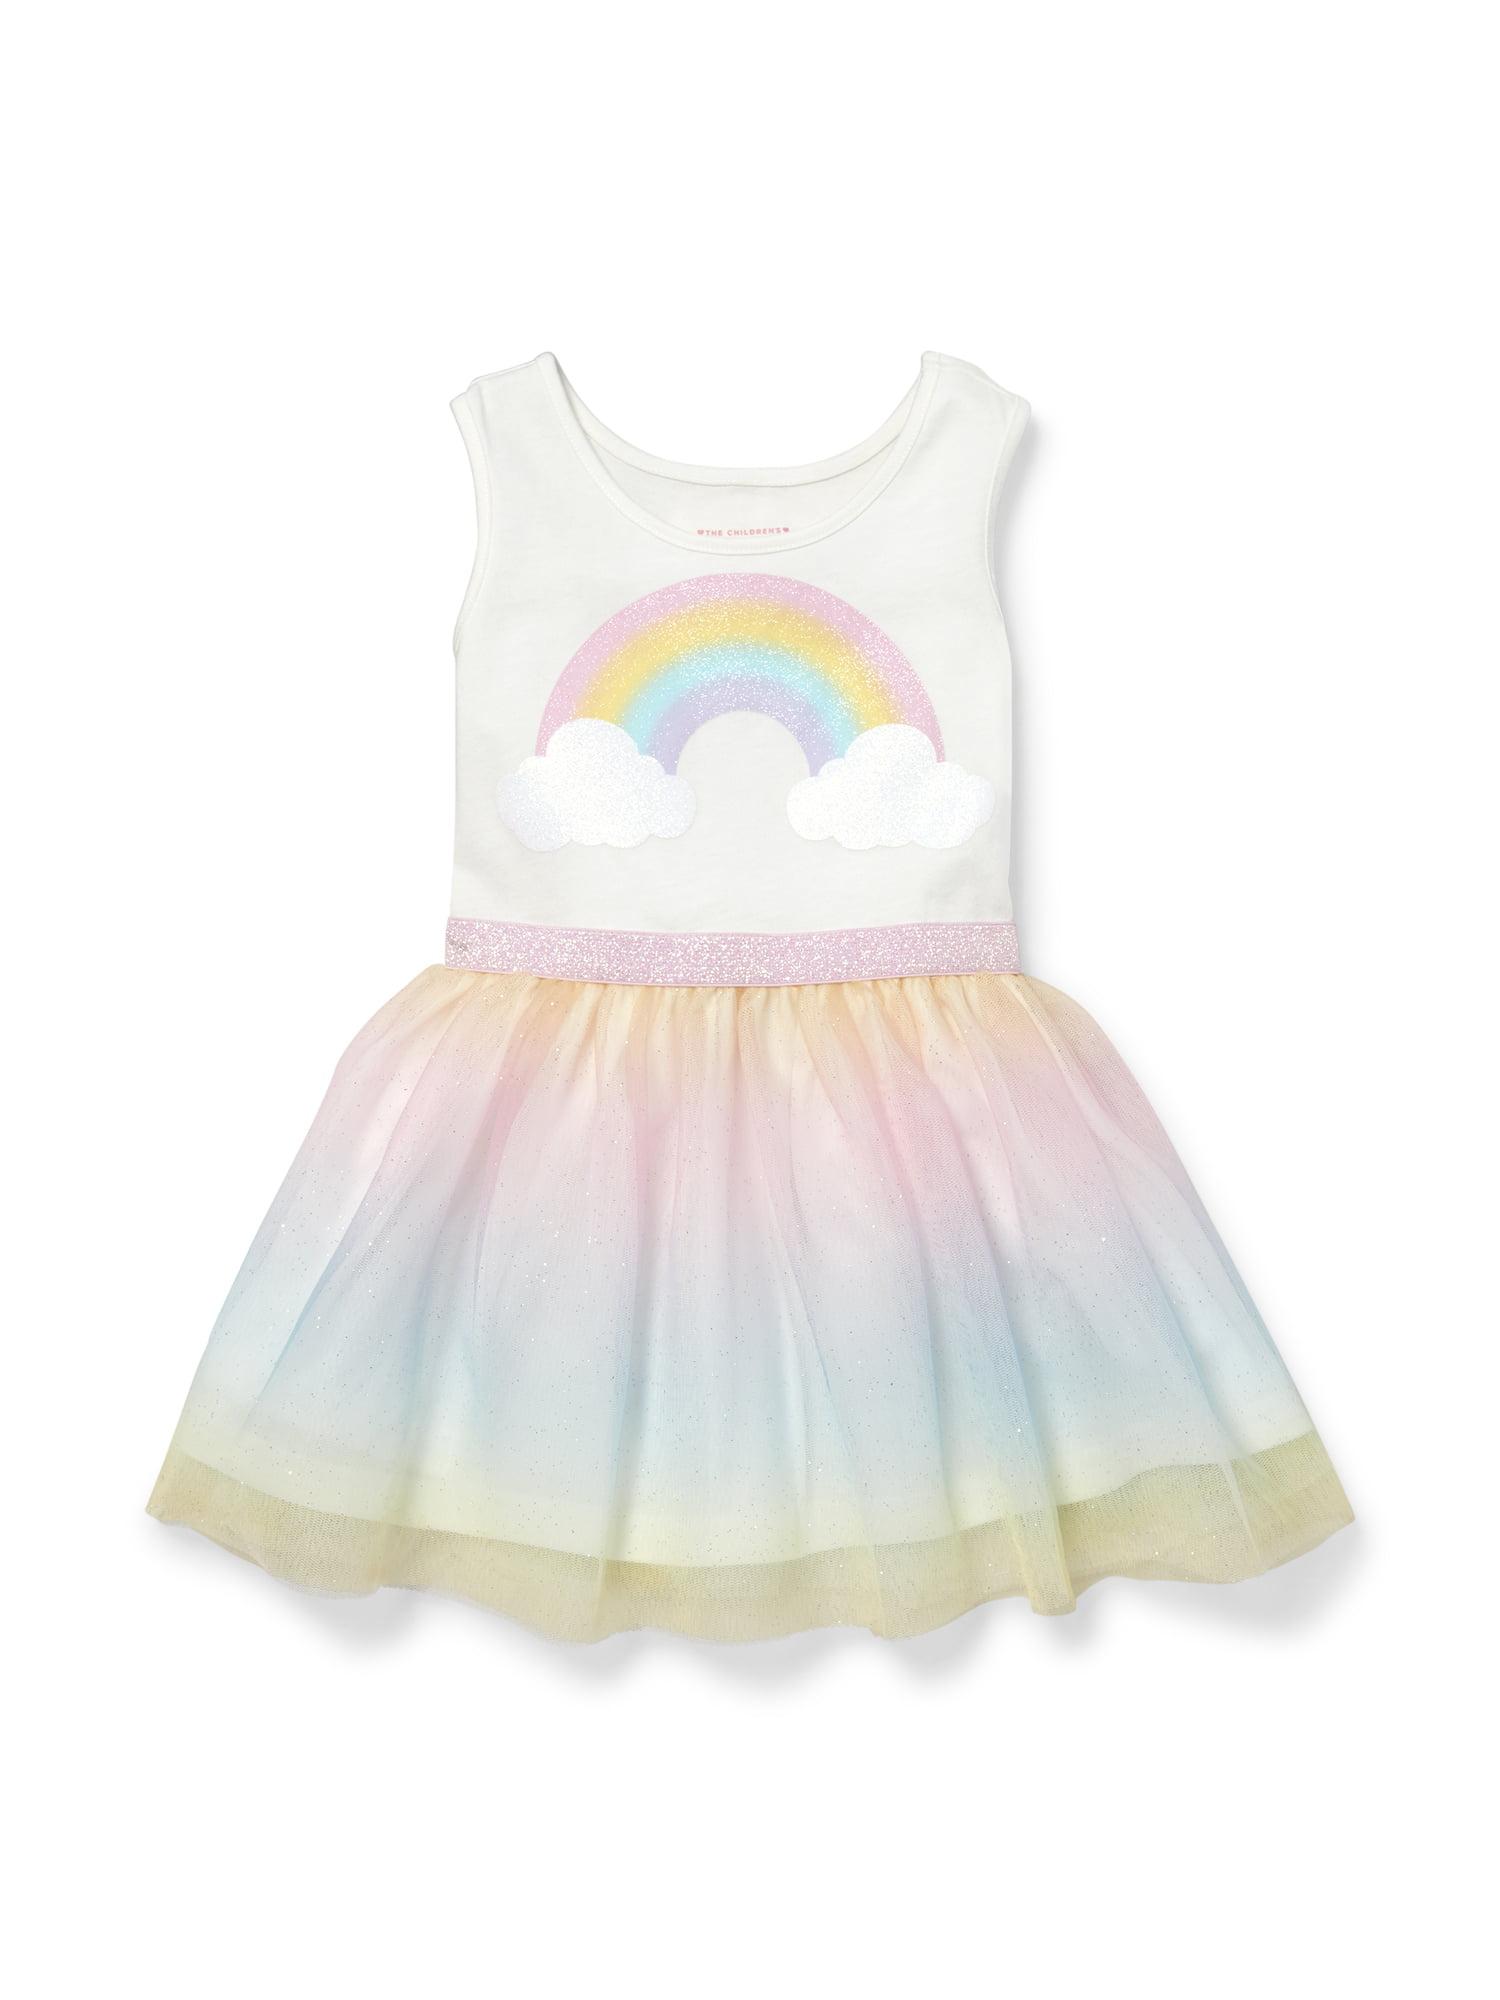 Knit To Woven Glitter Rainbow Dress (Baby Girls & Toddler Girls)